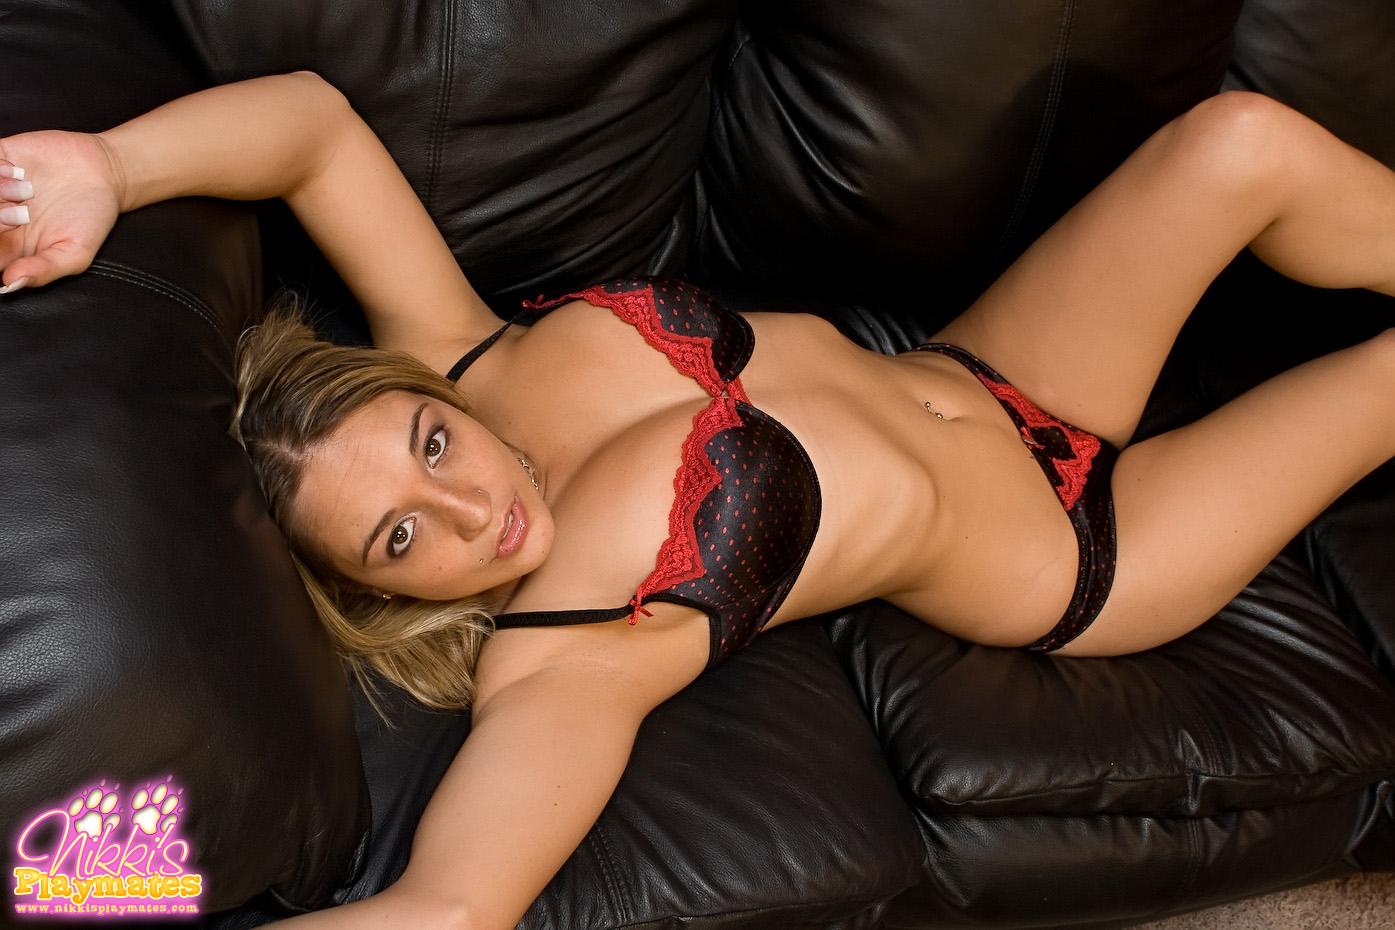 Nikki sims fucked porn picture